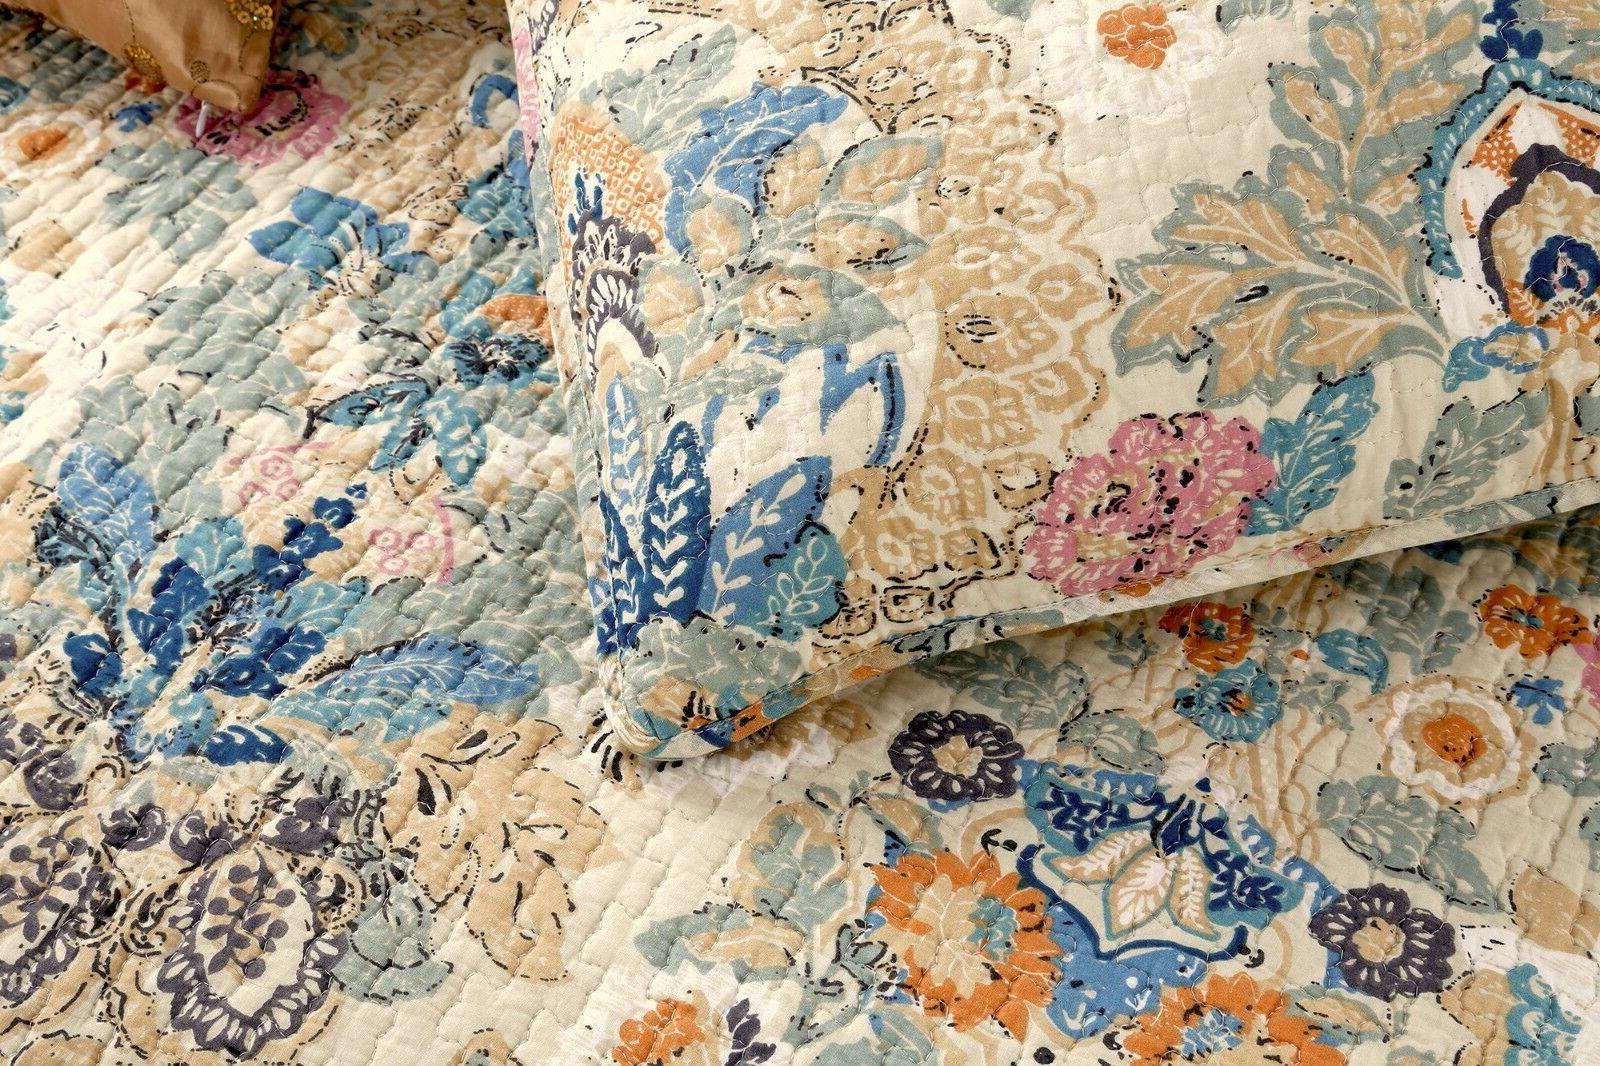 Pylle 100%Cotton Quilt Bedspread, Coverlet